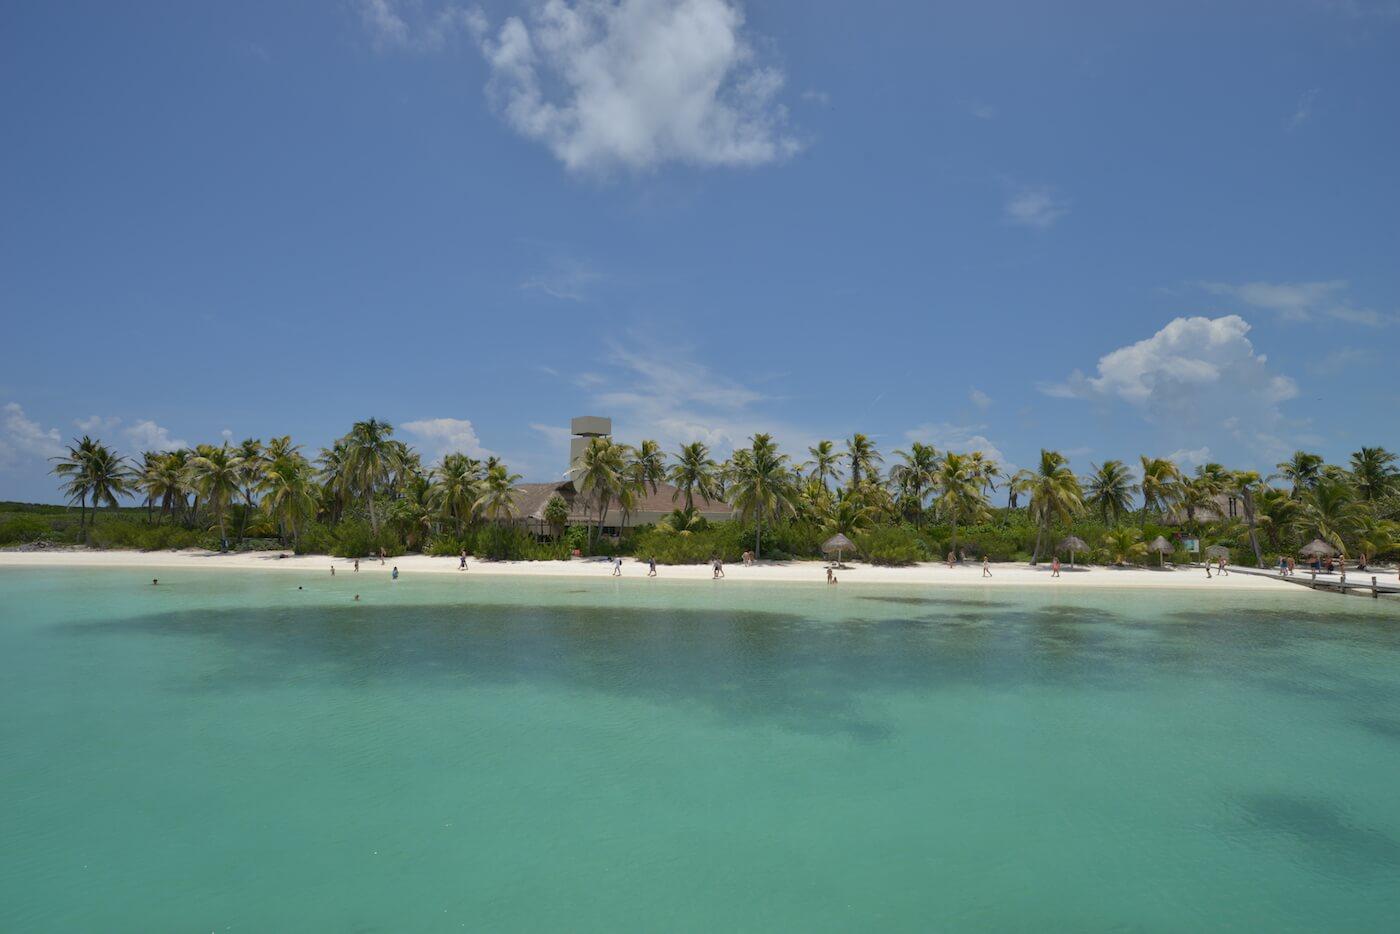 Isla-Contoy-Tours-Snorkel-Beach-All-Inclusive-Cancun-10